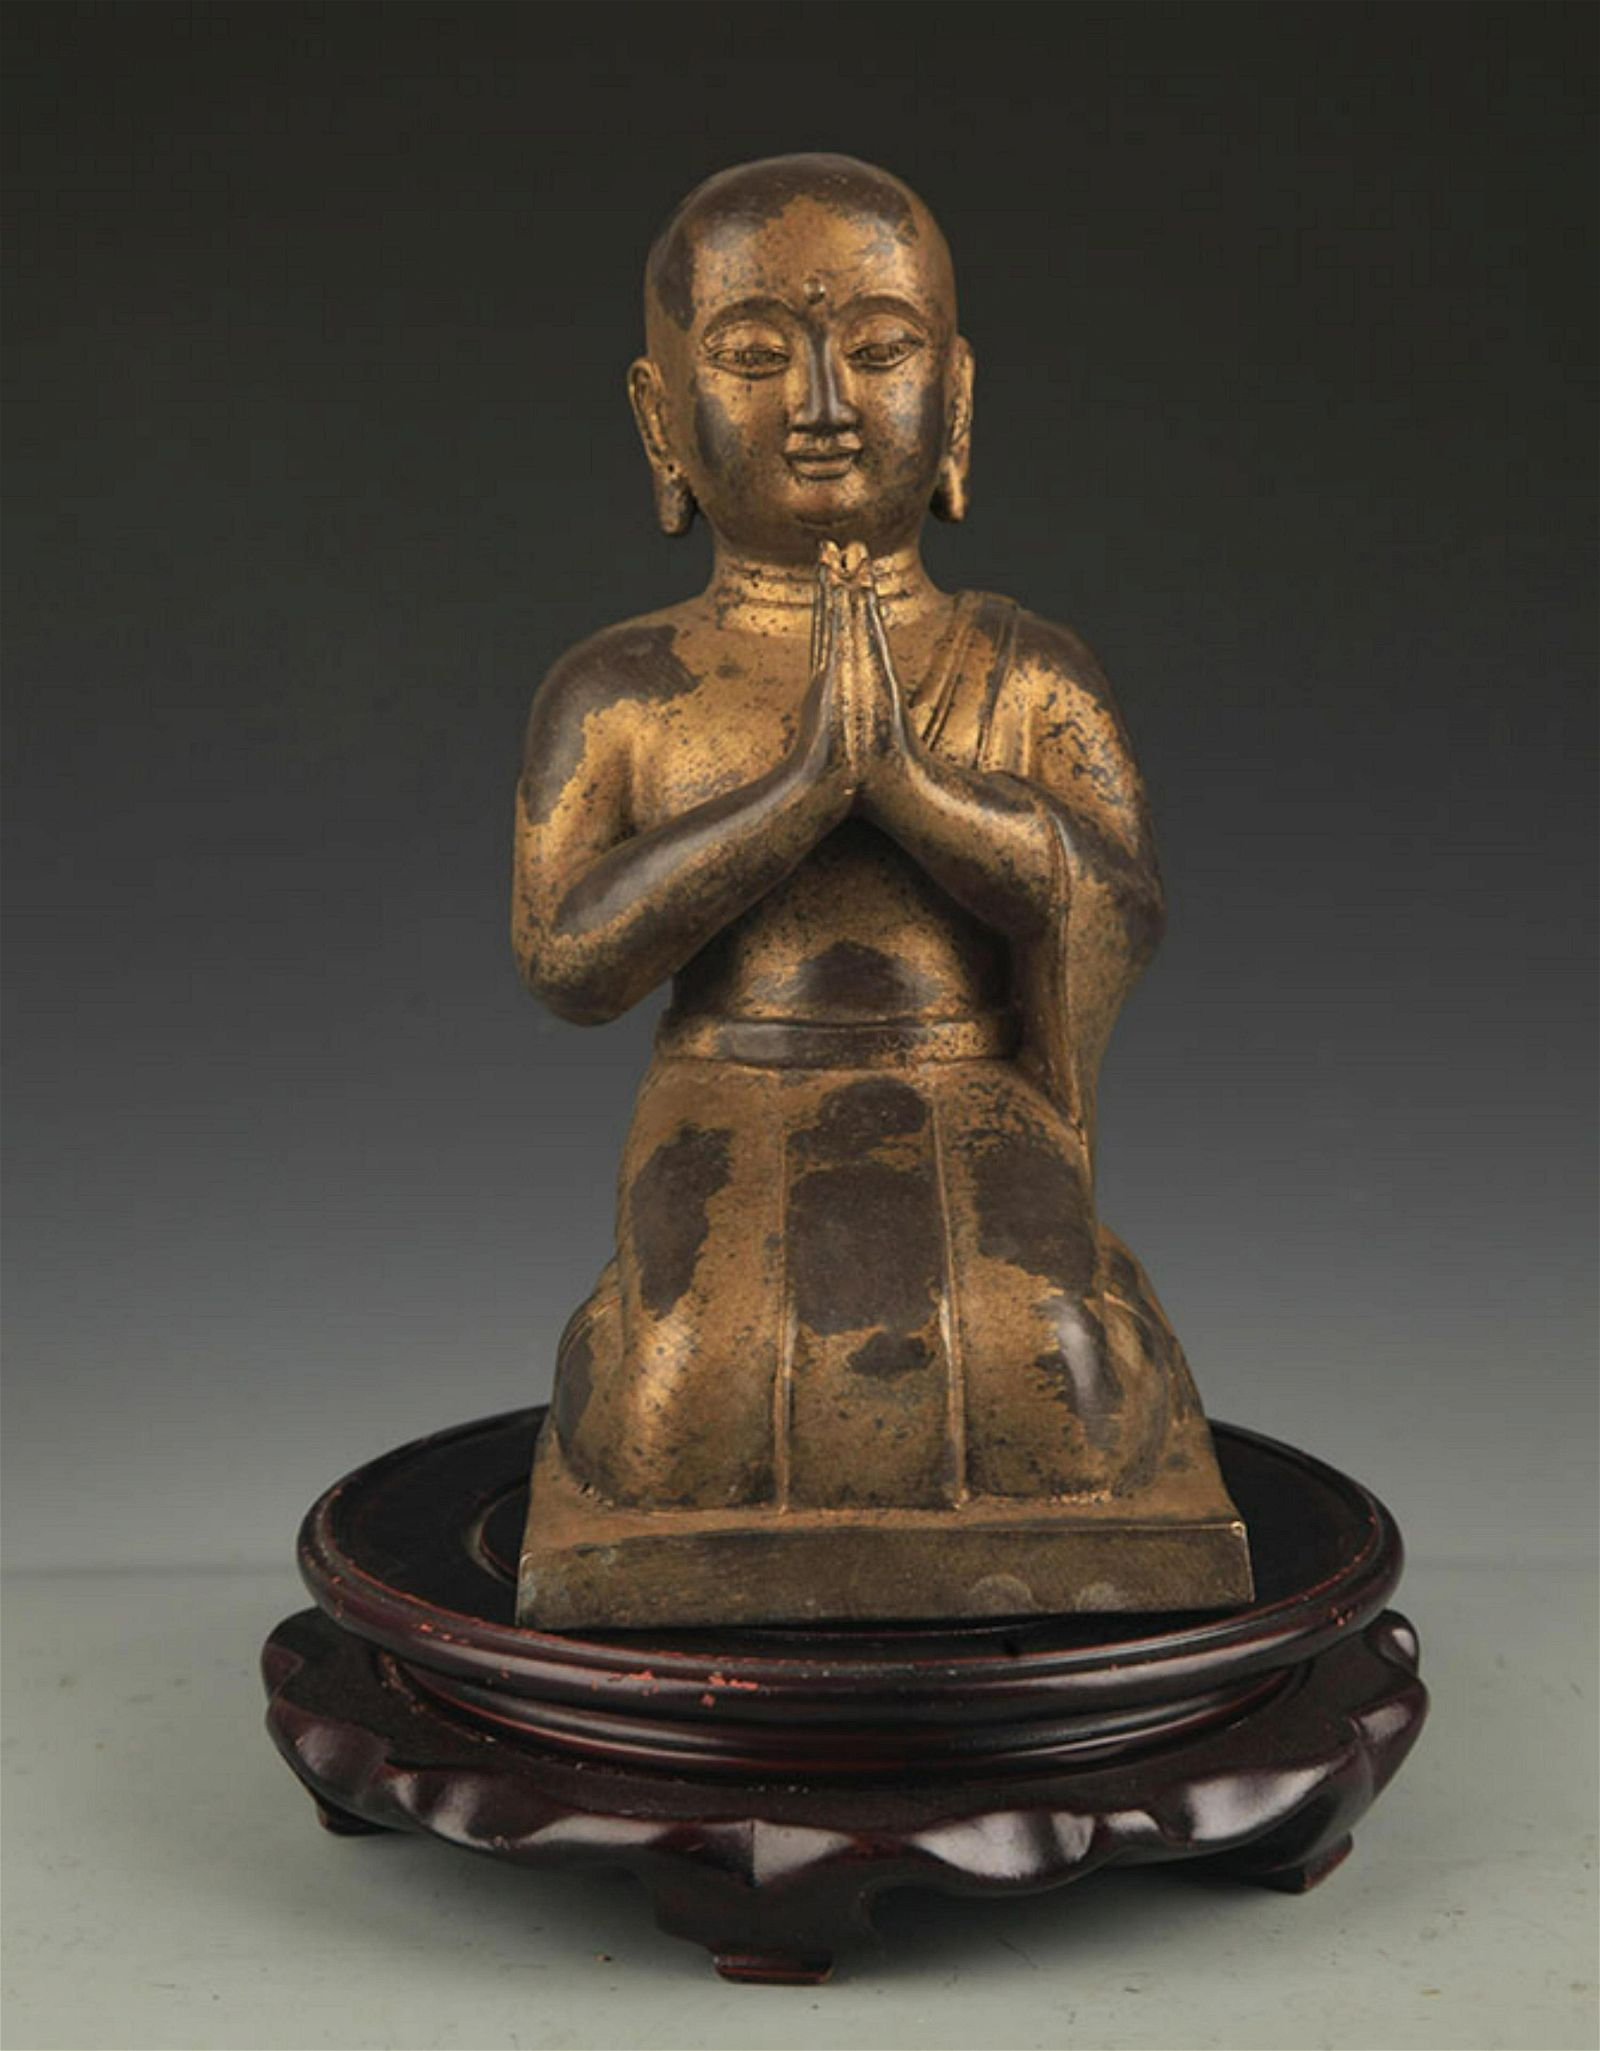 A FINE BRONZE KNEELING BUDDHA